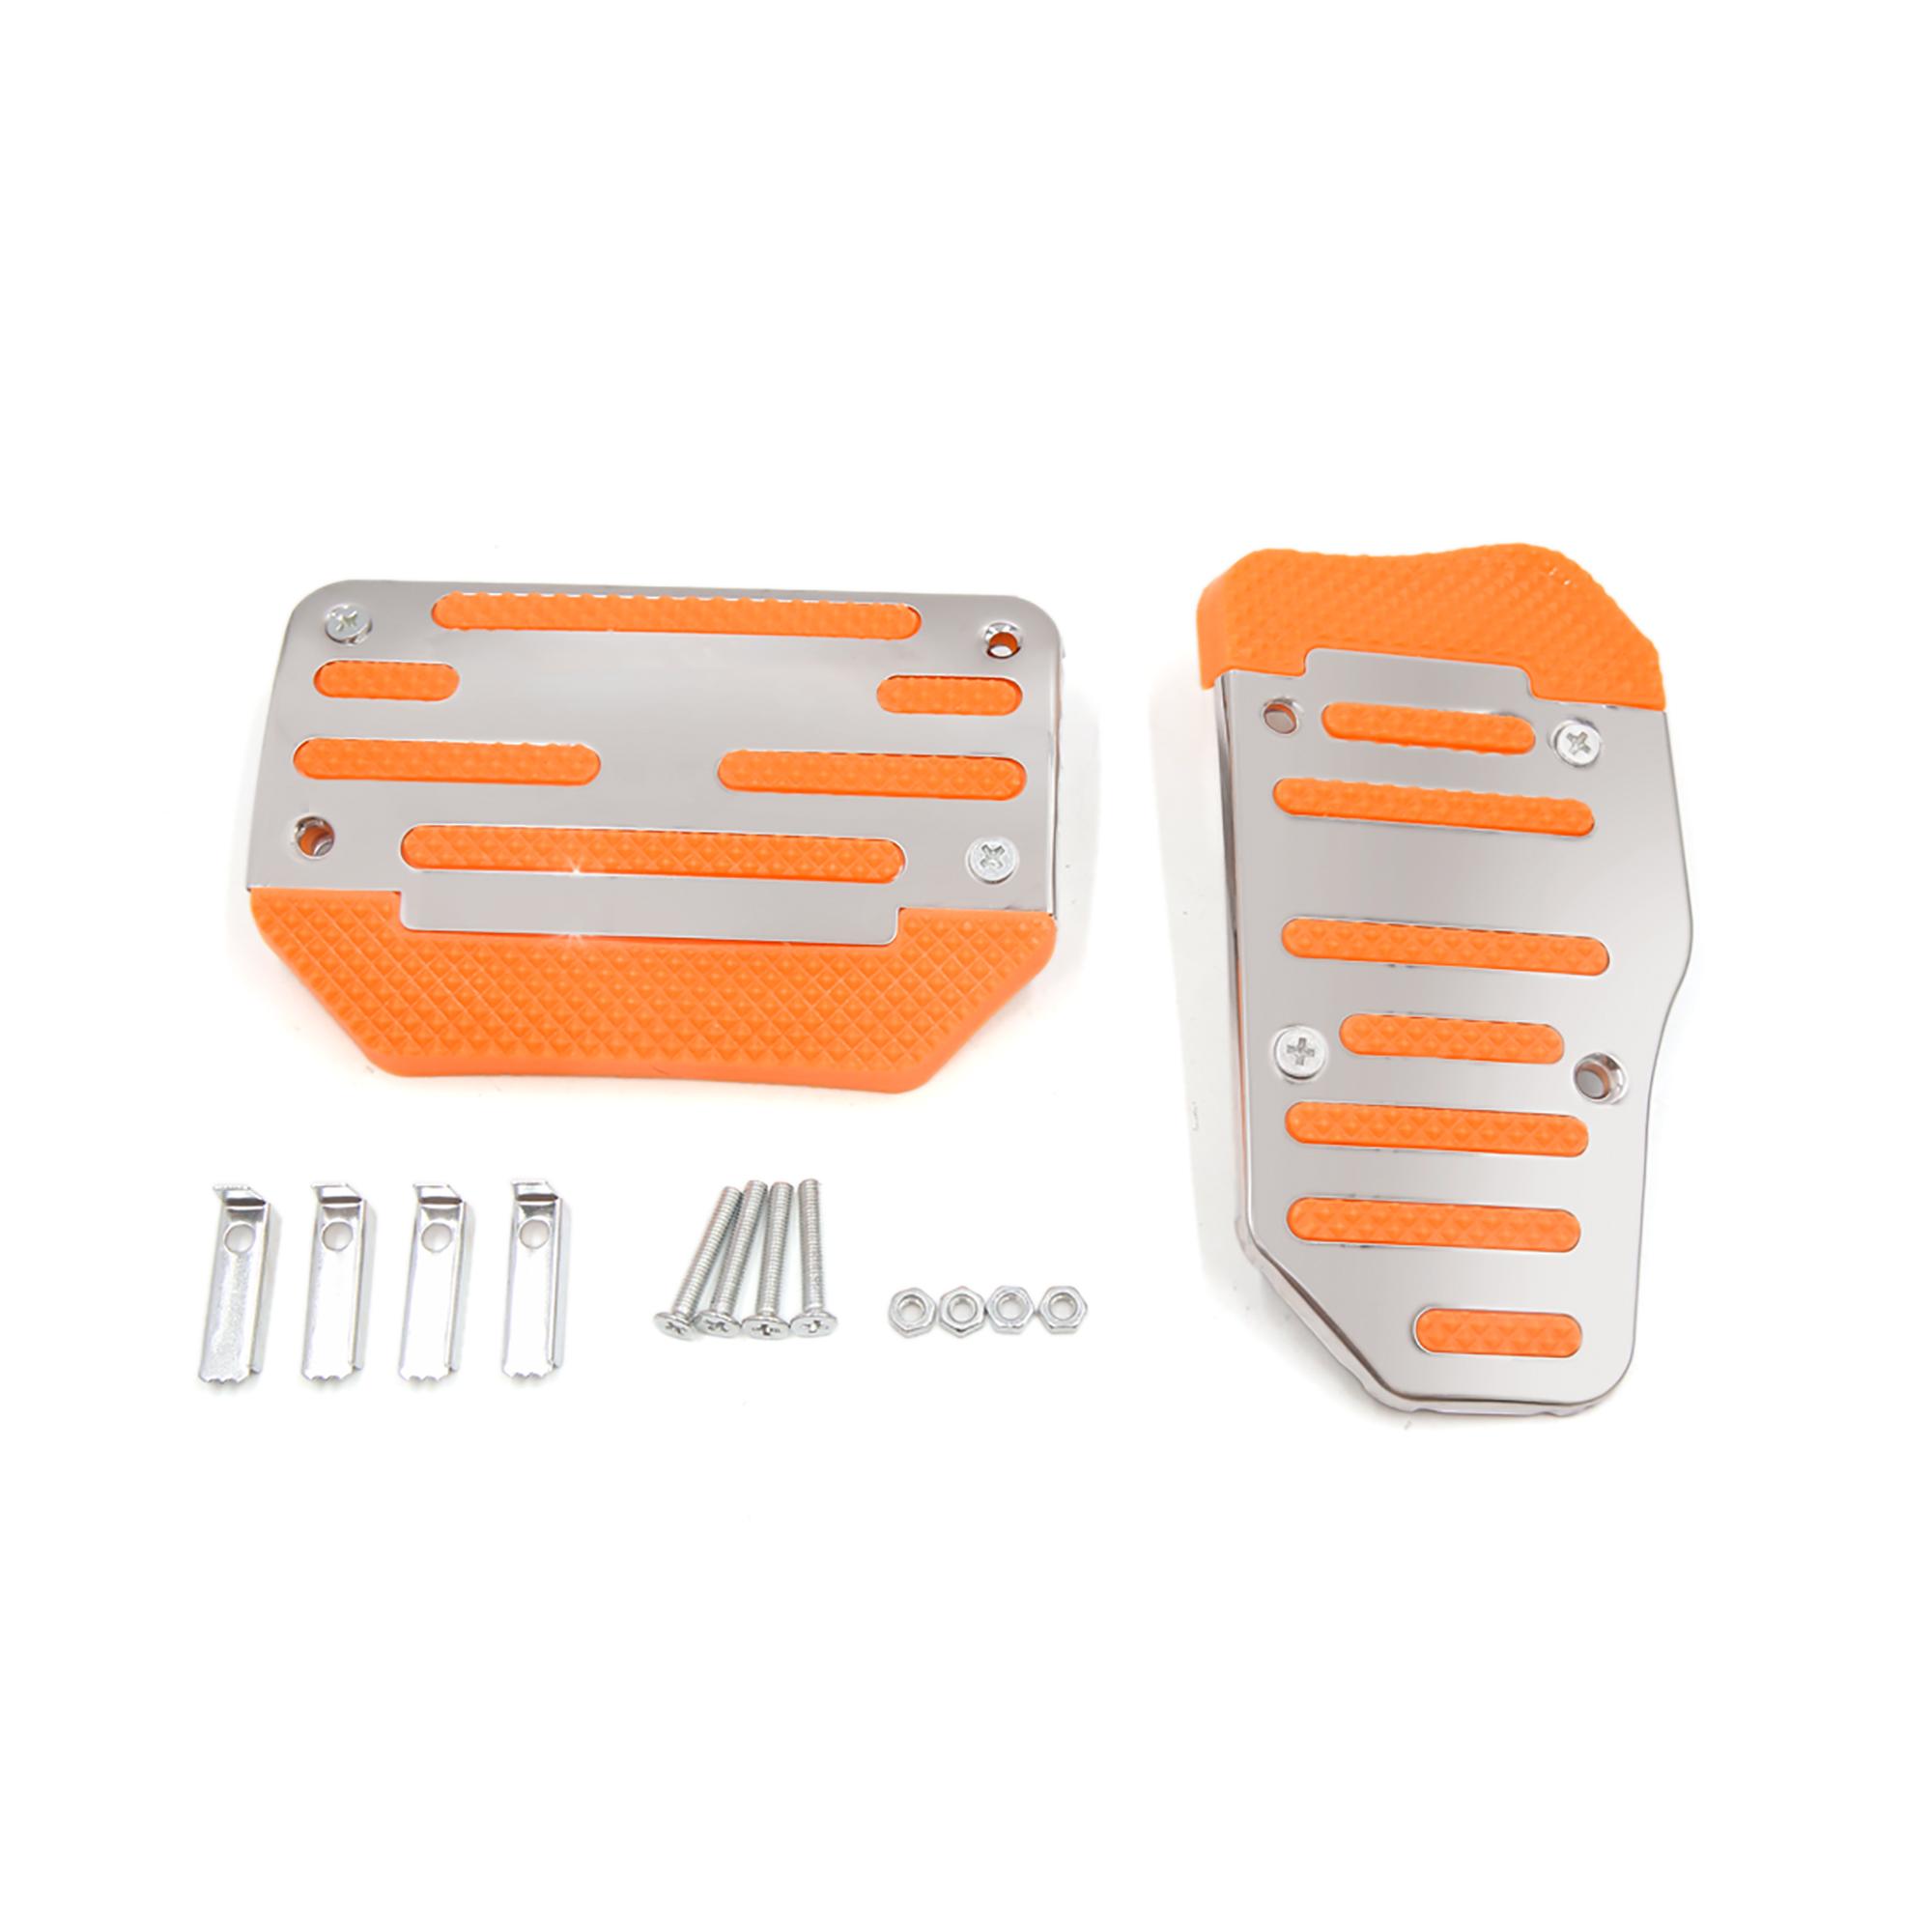 2 in 1 Non-Slip Automatic Car Gas Brake Pedal Pads Cover Orange